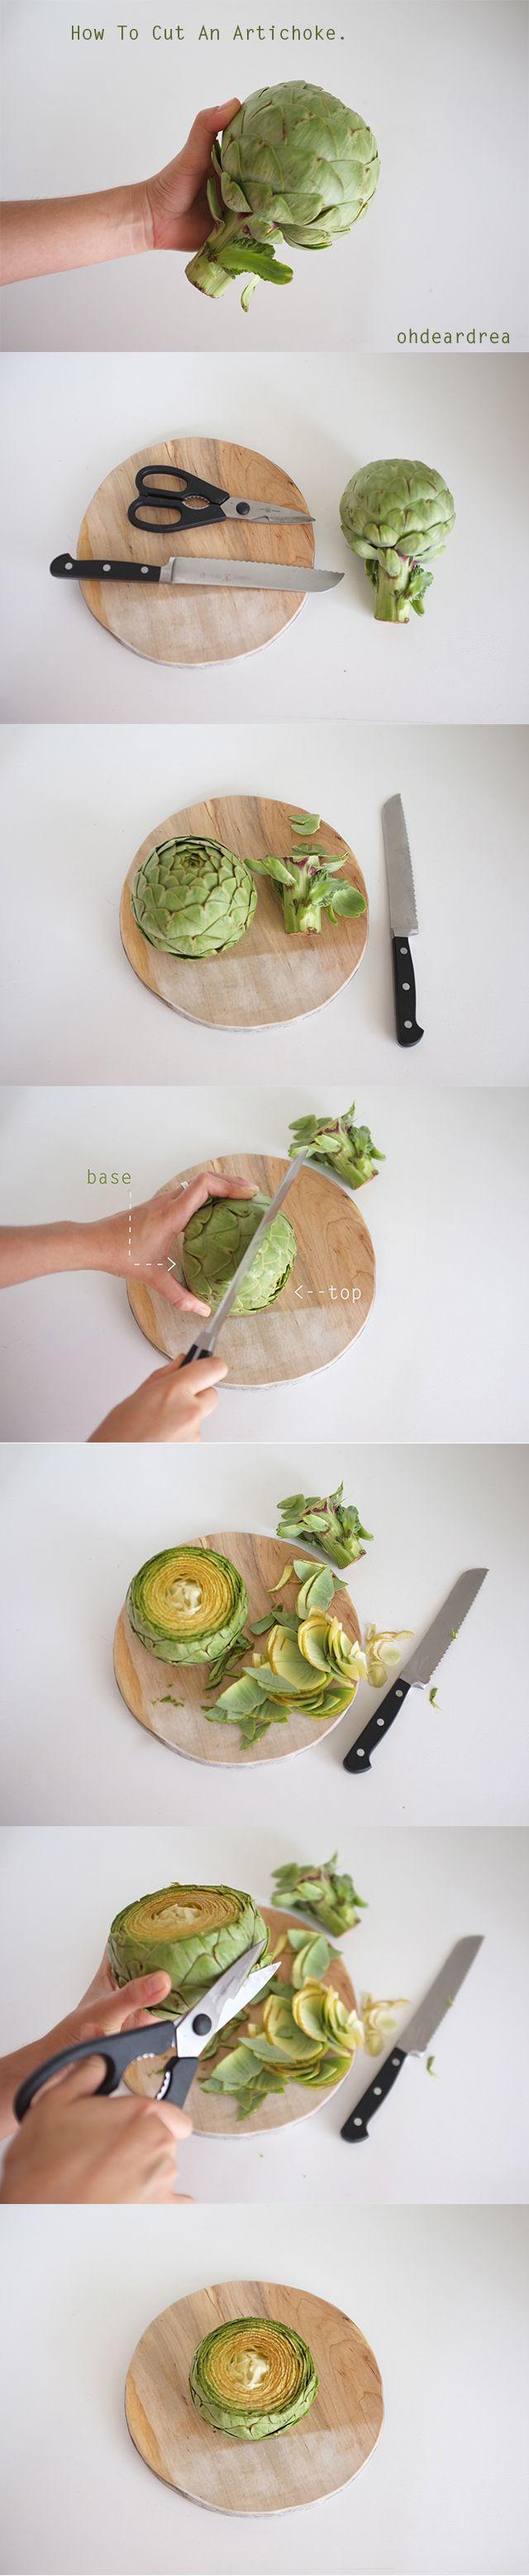 How To Cook An Artichoke - ohdeardrea